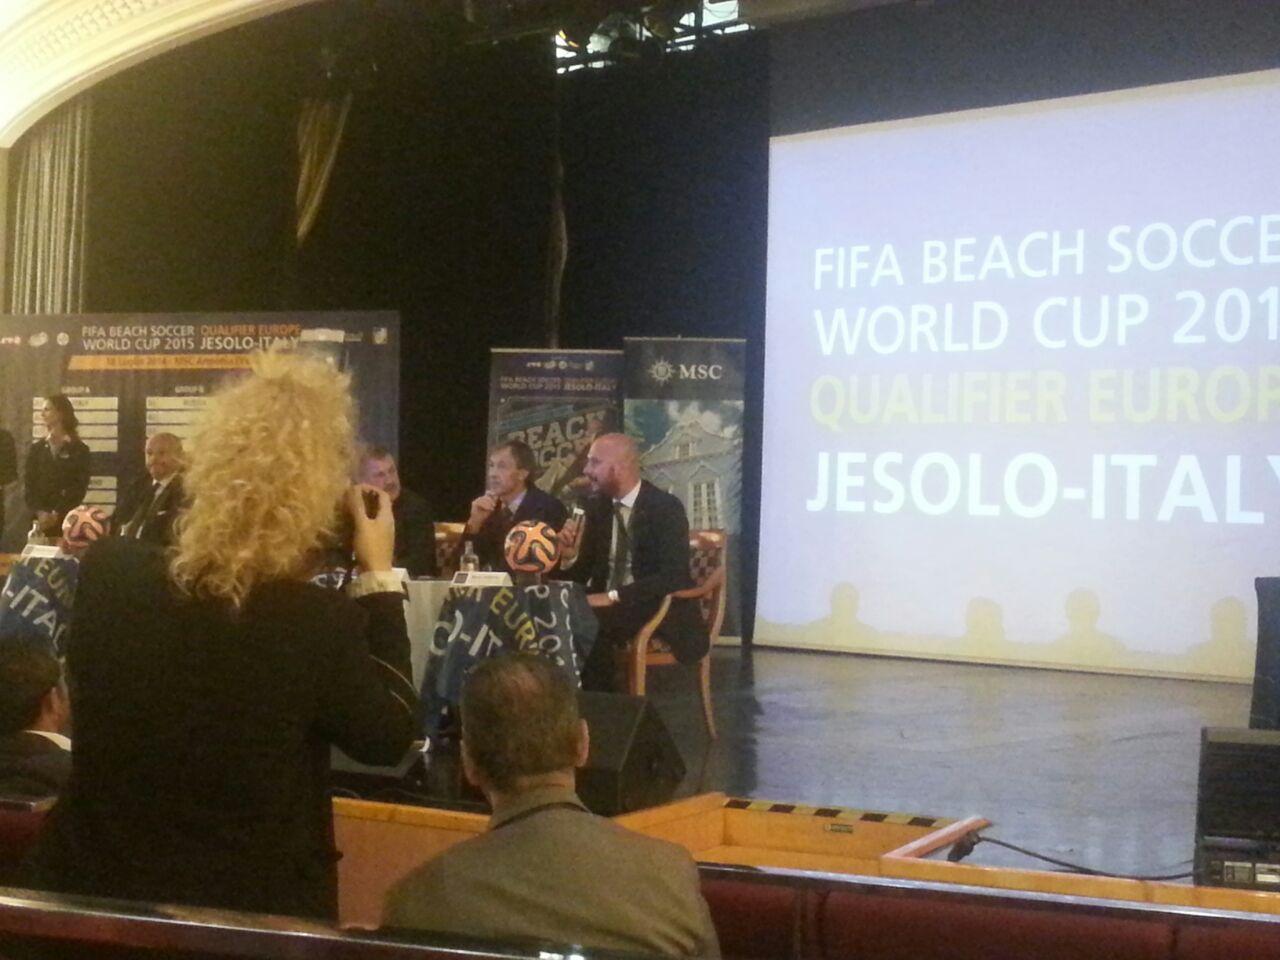 18/7/14 MSC Armonia -  Evento Fifa Beach soccer world cup-diretta-liveboat-msc-armonia-fifa-event-12-jpg